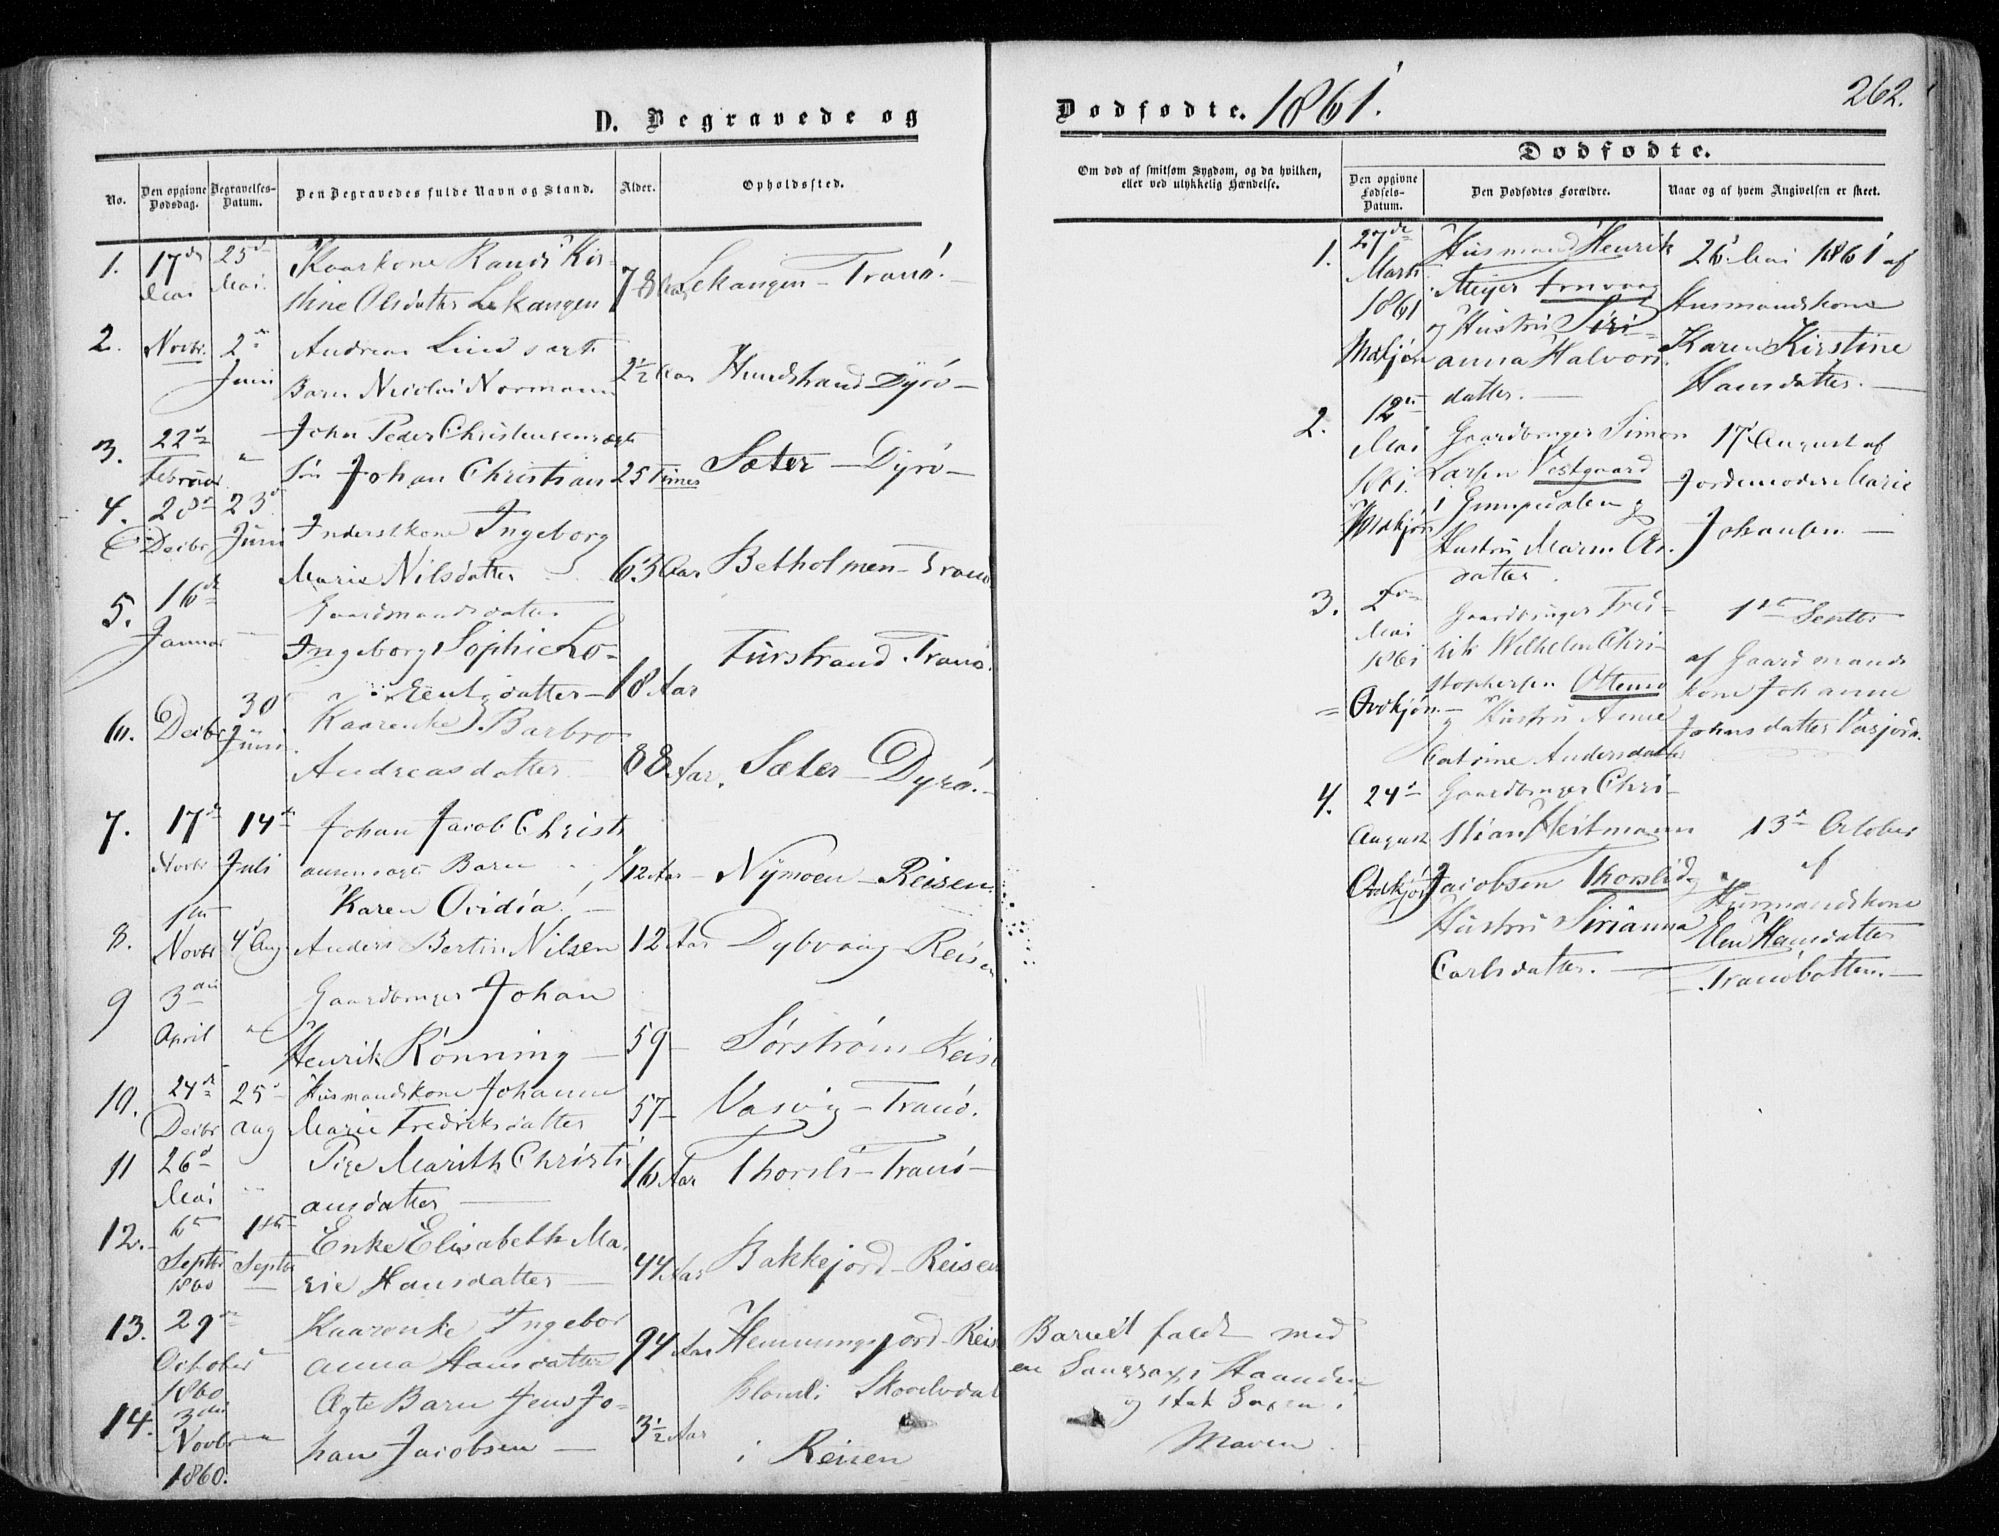 SATØ, Tranøy sokneprestkontor, I/Ia/Iaa/L0007kirke: Ministerialbok nr. 7, 1856-1866, s. 262